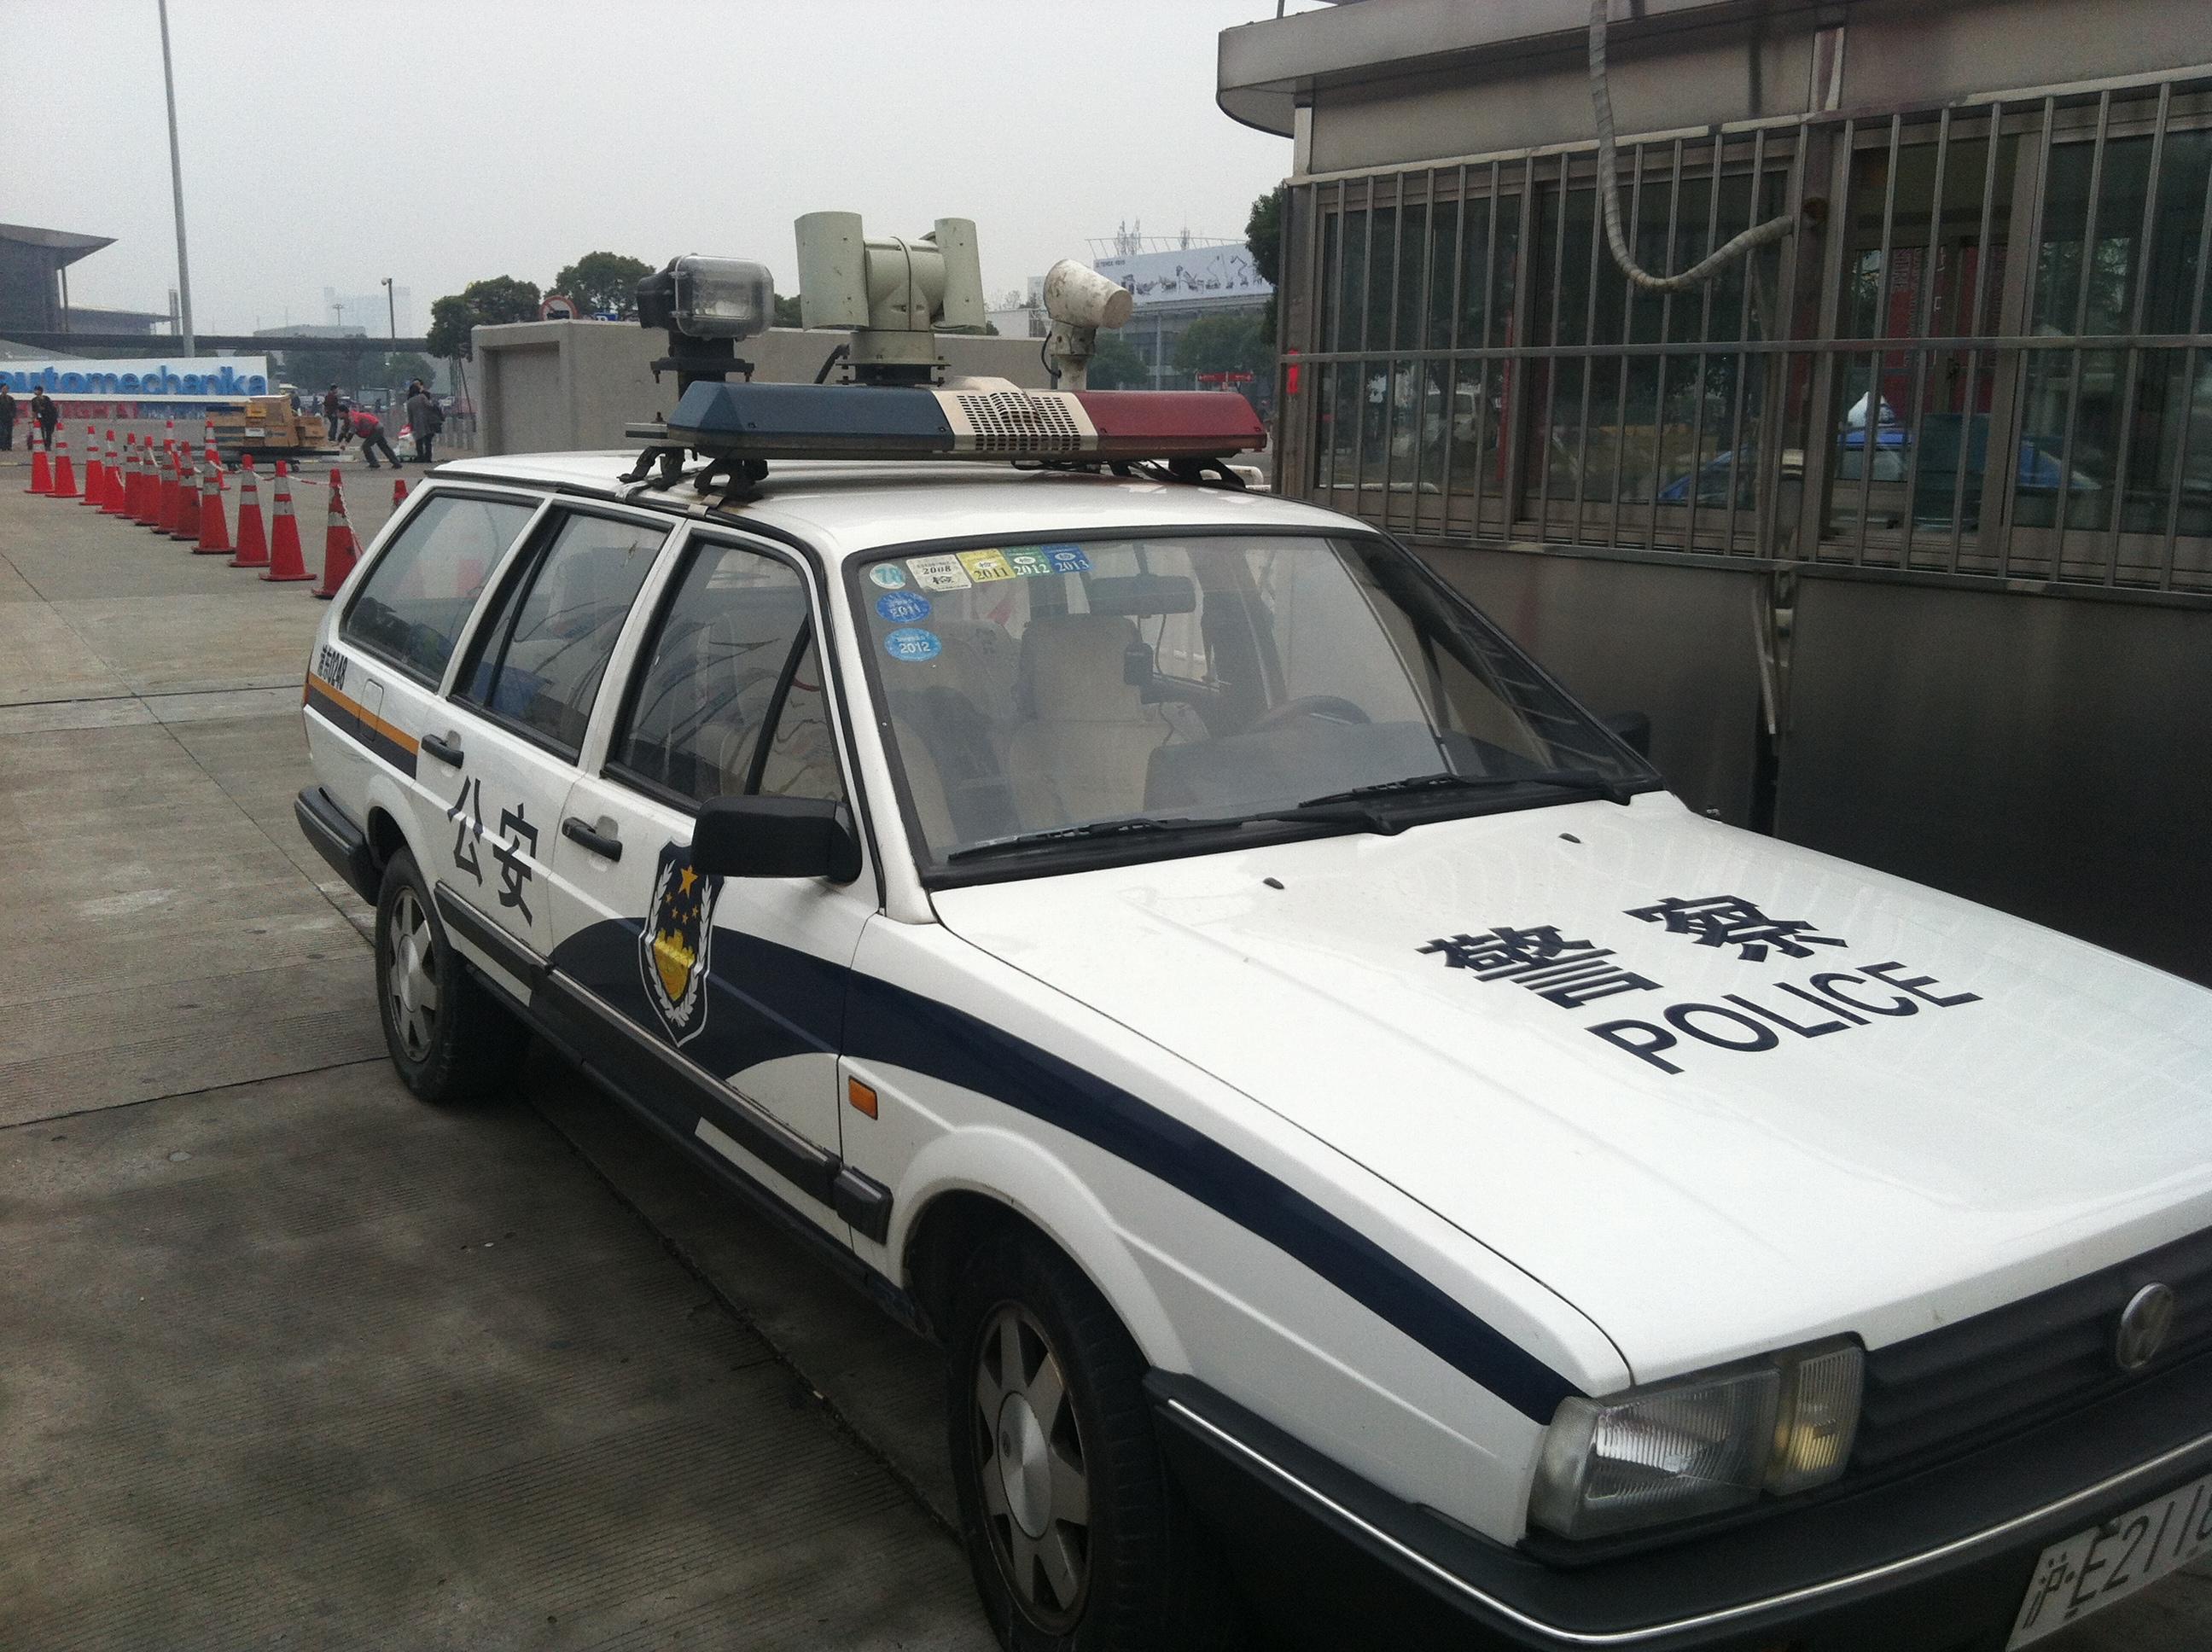 Model 970 on Police car